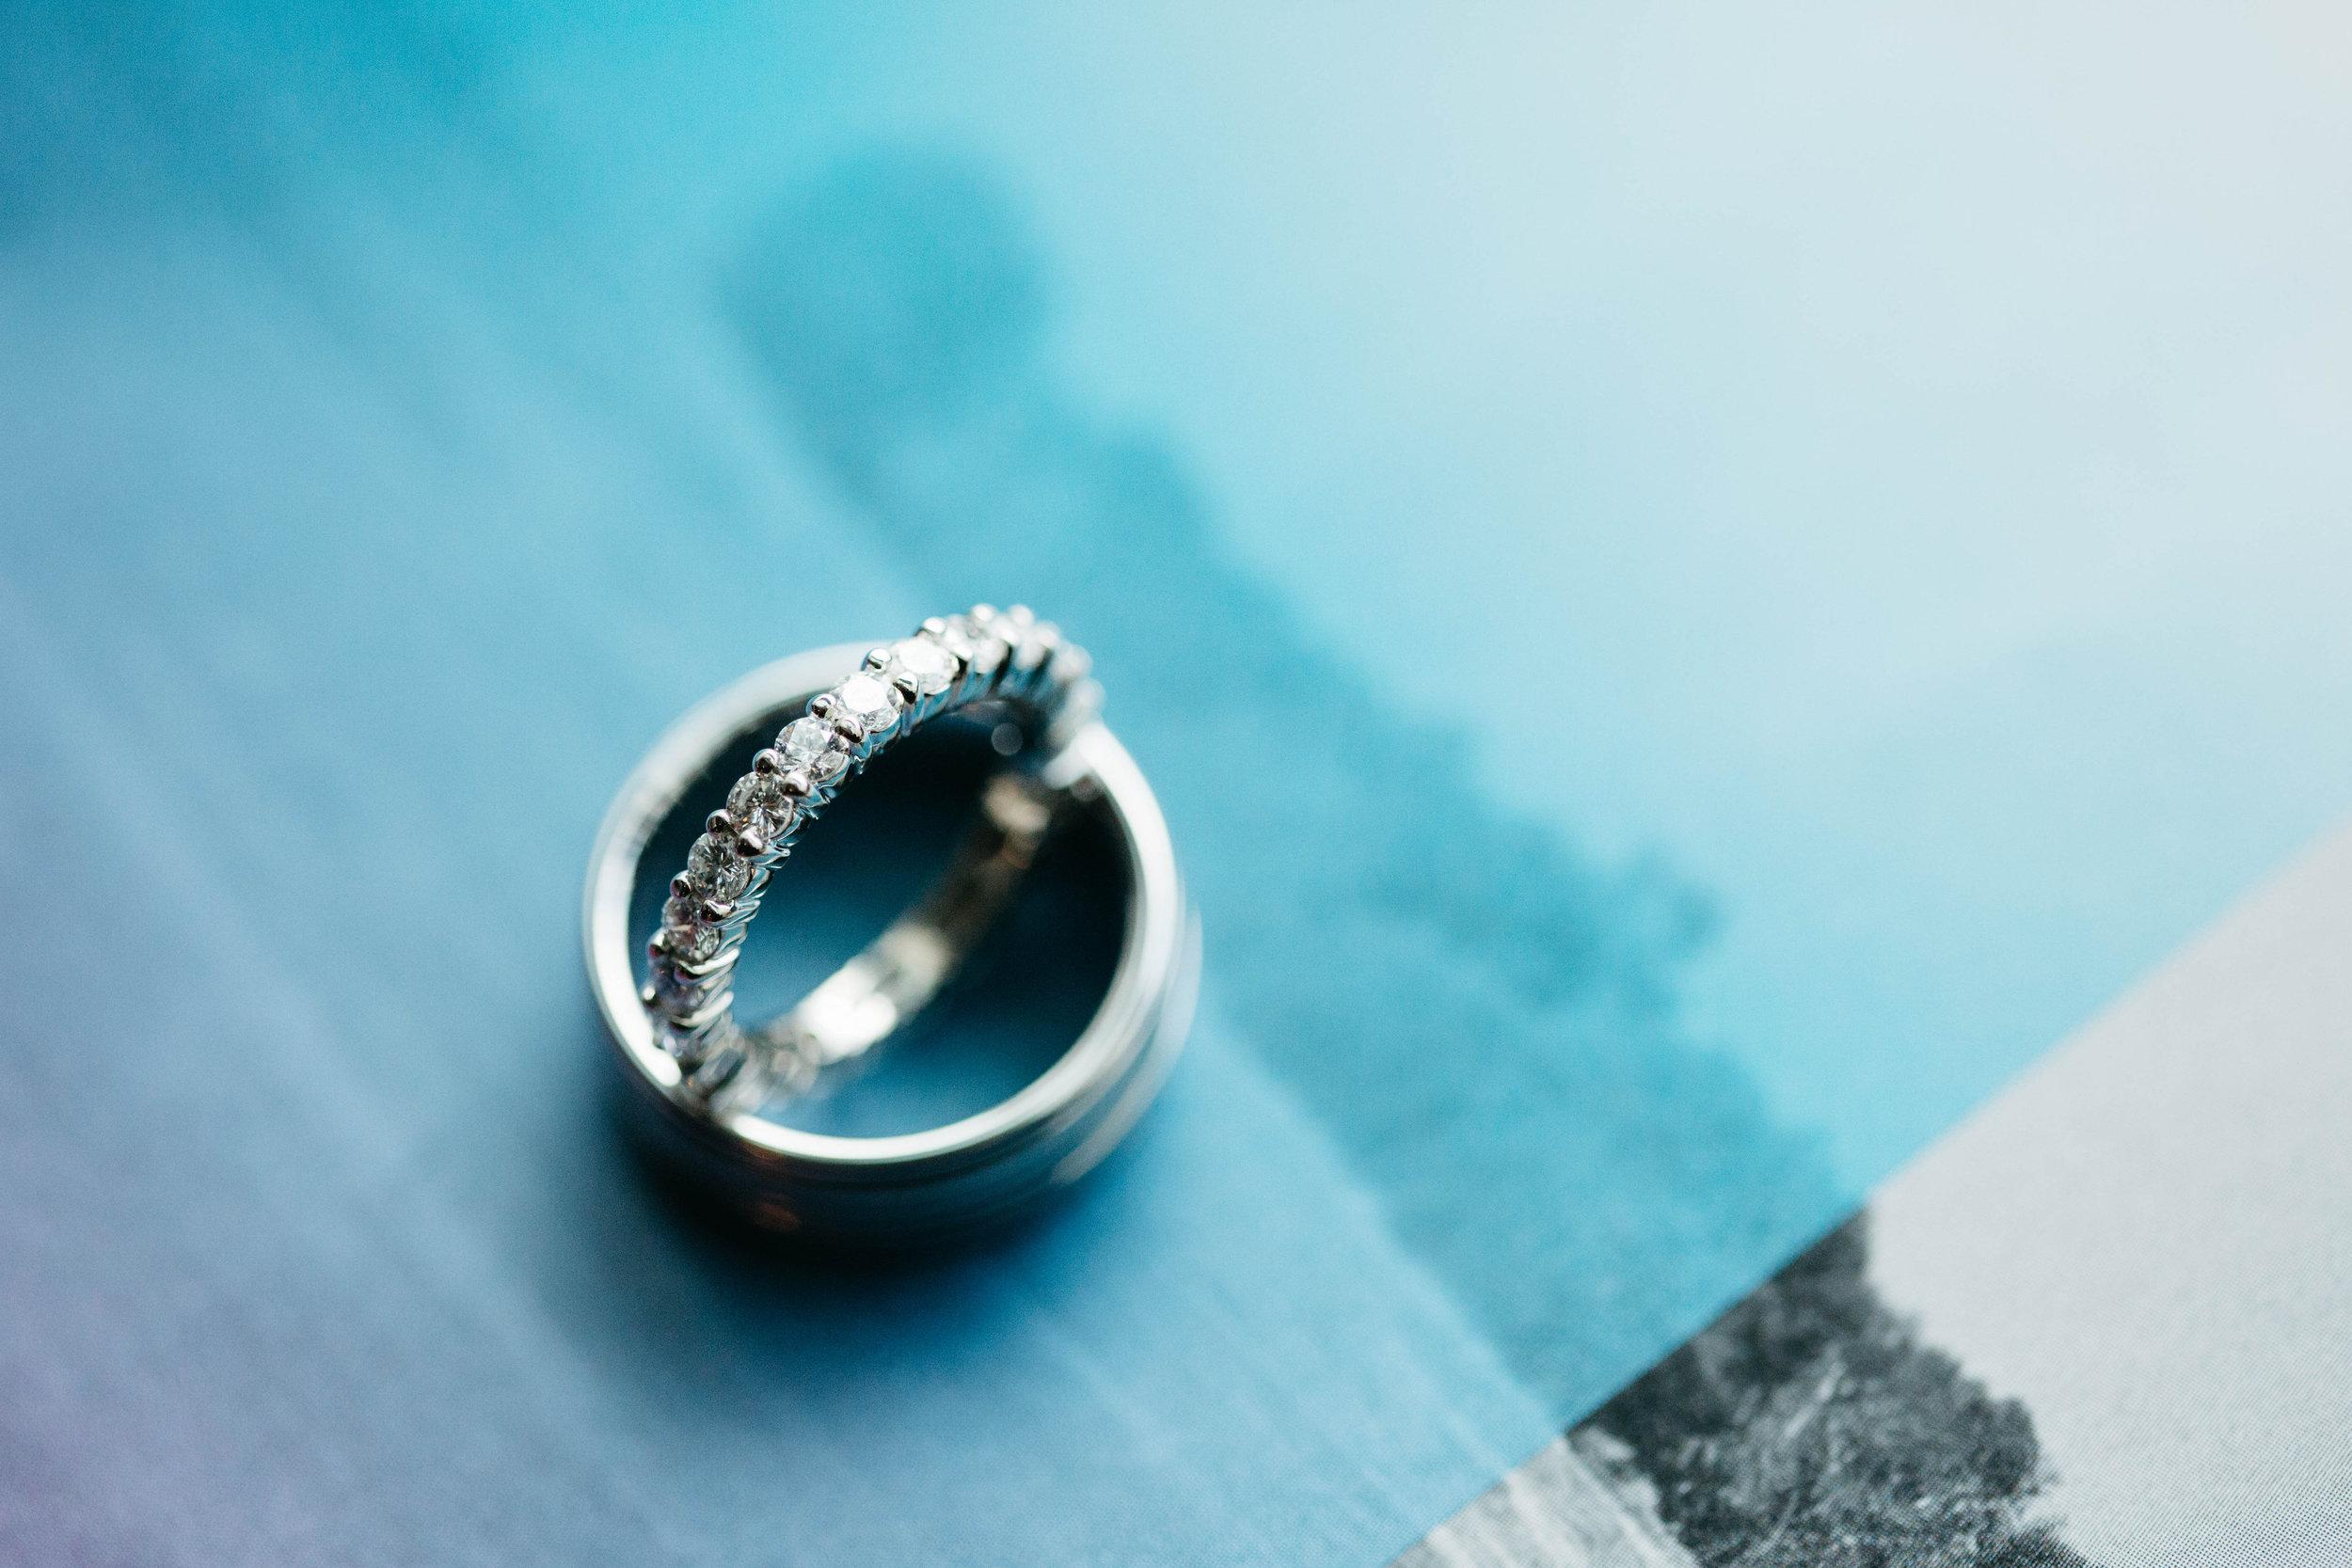 08 New Years Eve Wedding Rings Something Blue Aribella Events.jpg